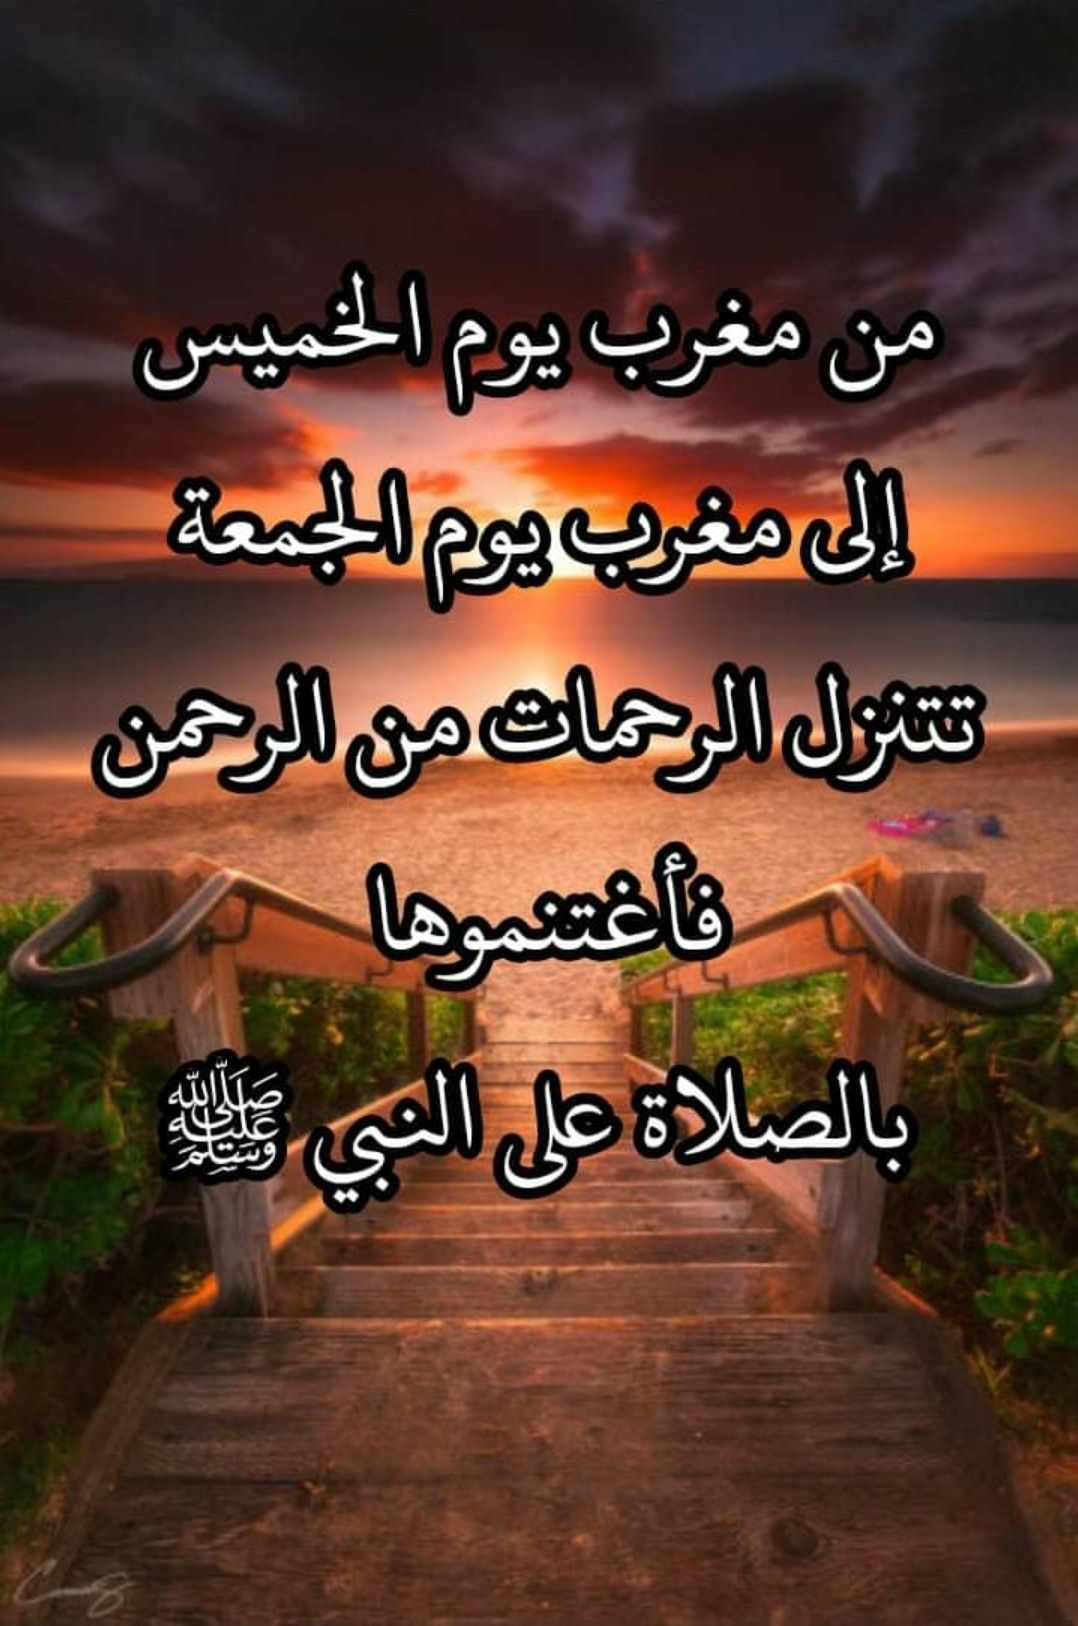 Pin By The Noble Quran On الصلاه على النبي صلى الله عليه وسلم Evening Quotes Animation Lockscreen